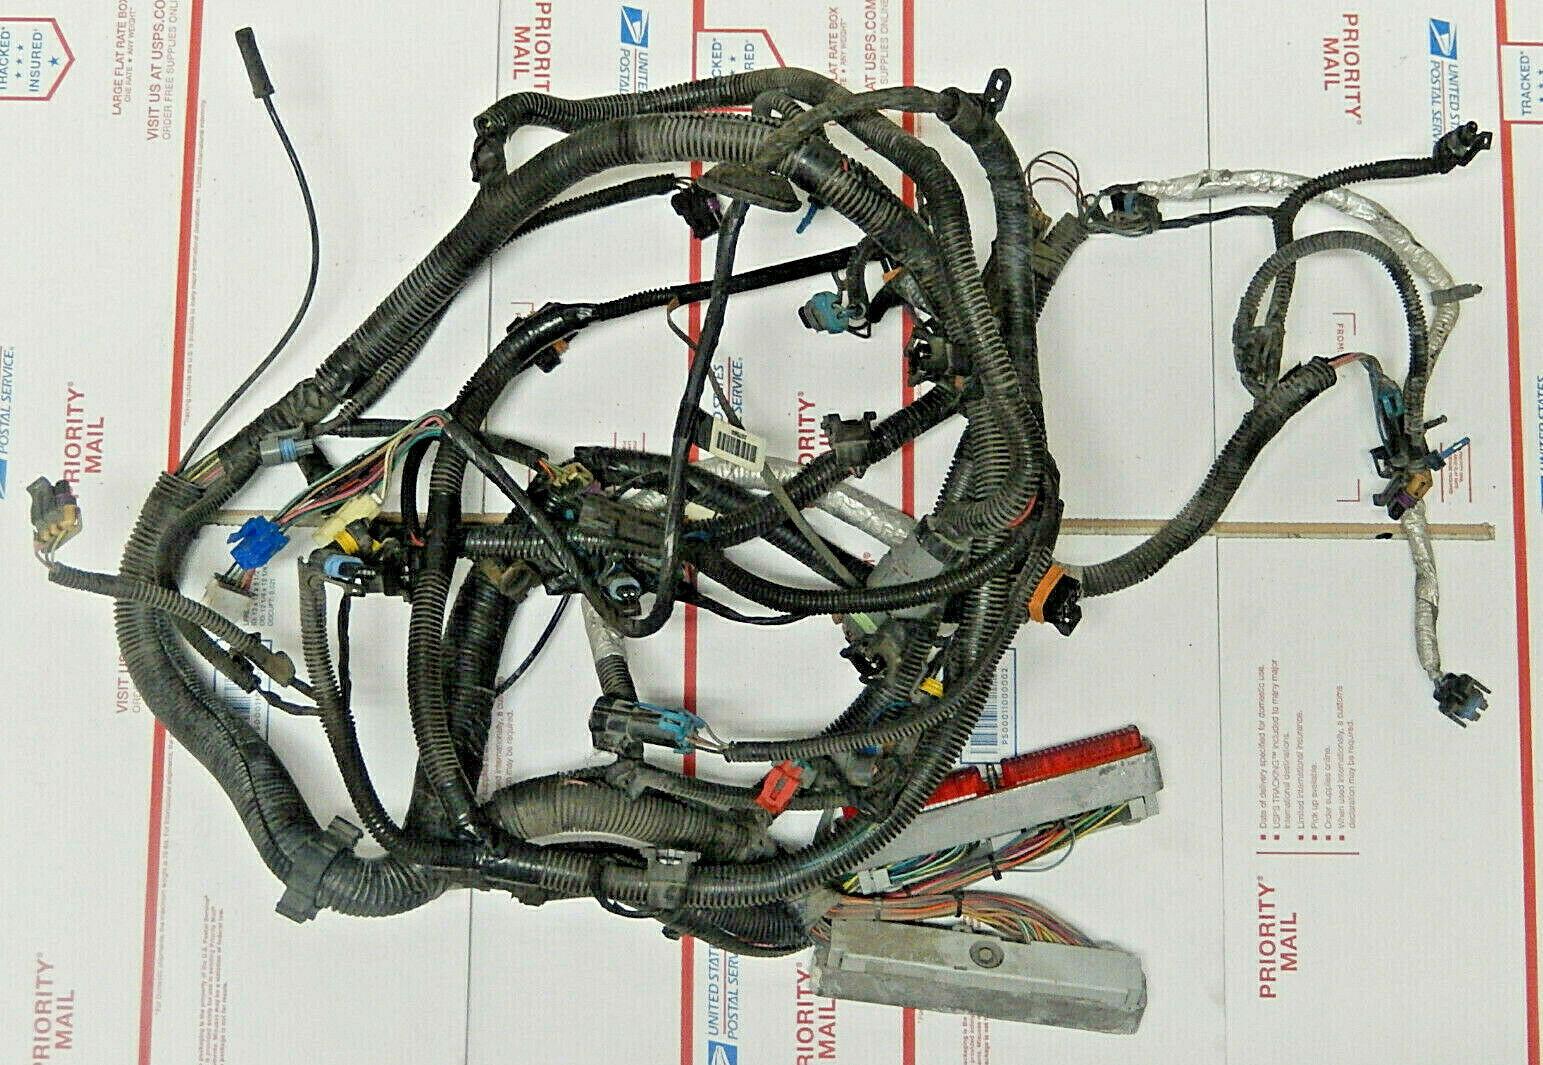 1998 camaro wiring harness - wiring diagram trace-foot-a -  trace-foot-a.zaafran.it  zaafran.it